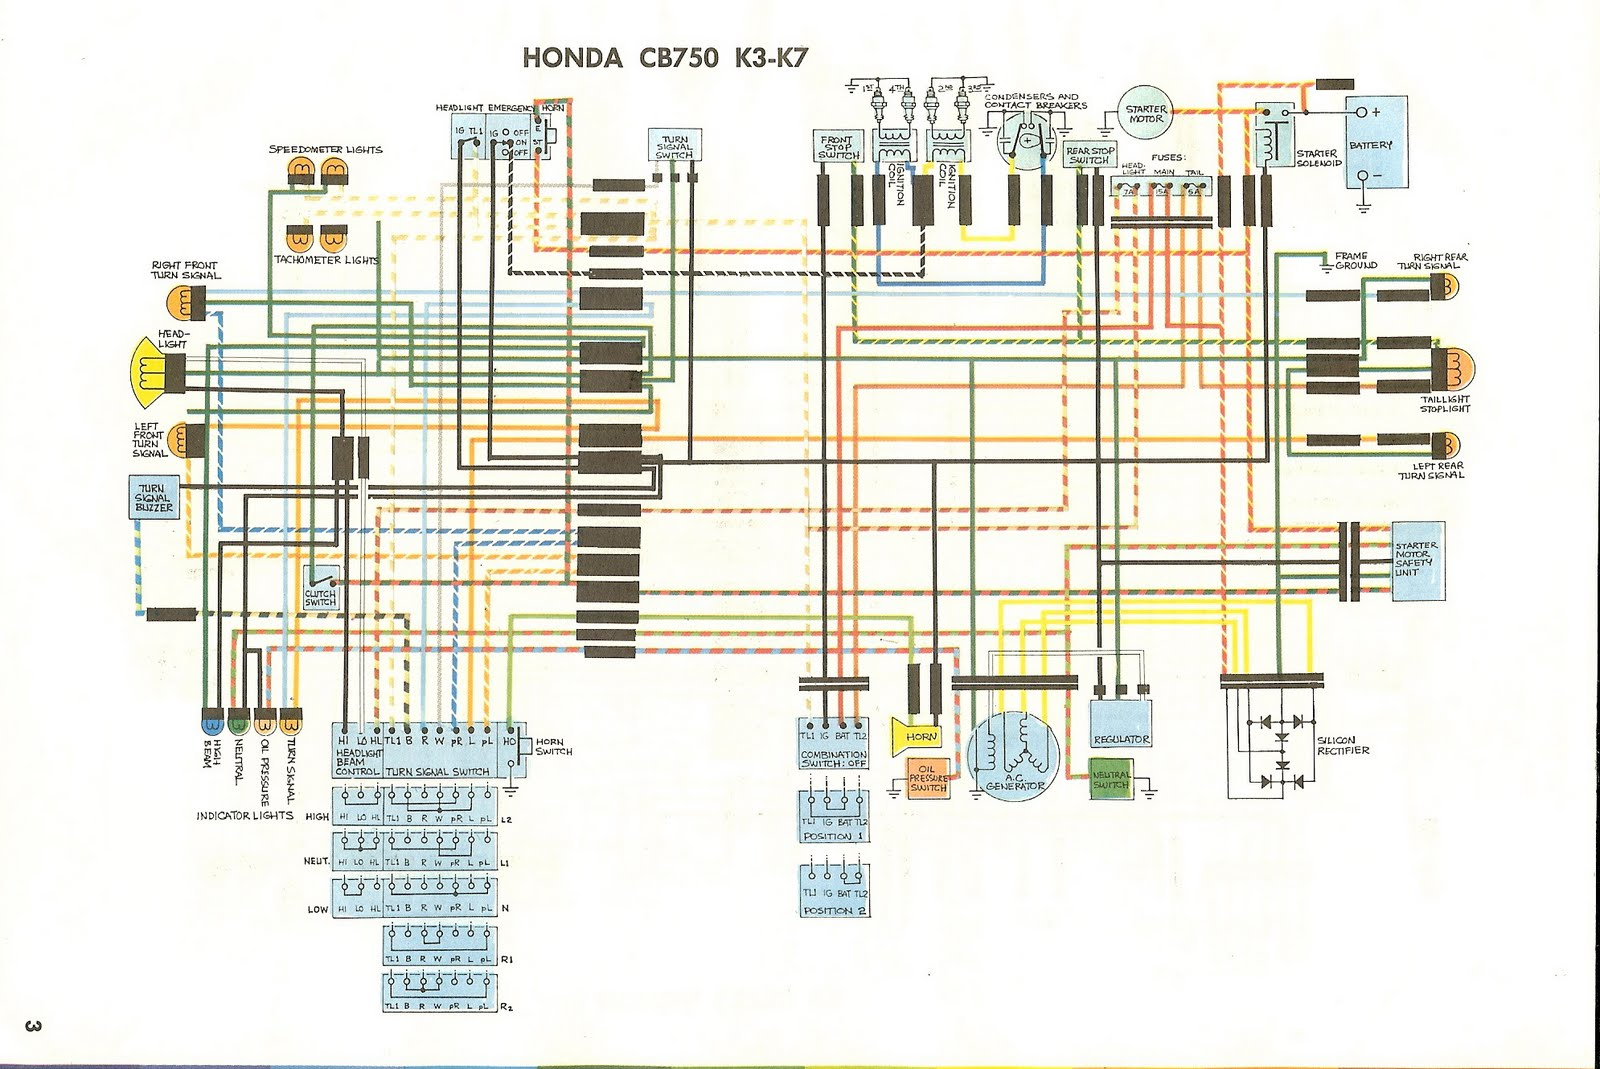 1978 honda cb750 wiring diagram 1978 image wiring honda cb750 wiring schematic honda auto wiring diagram schematic on 1978 honda cb750 wiring diagram